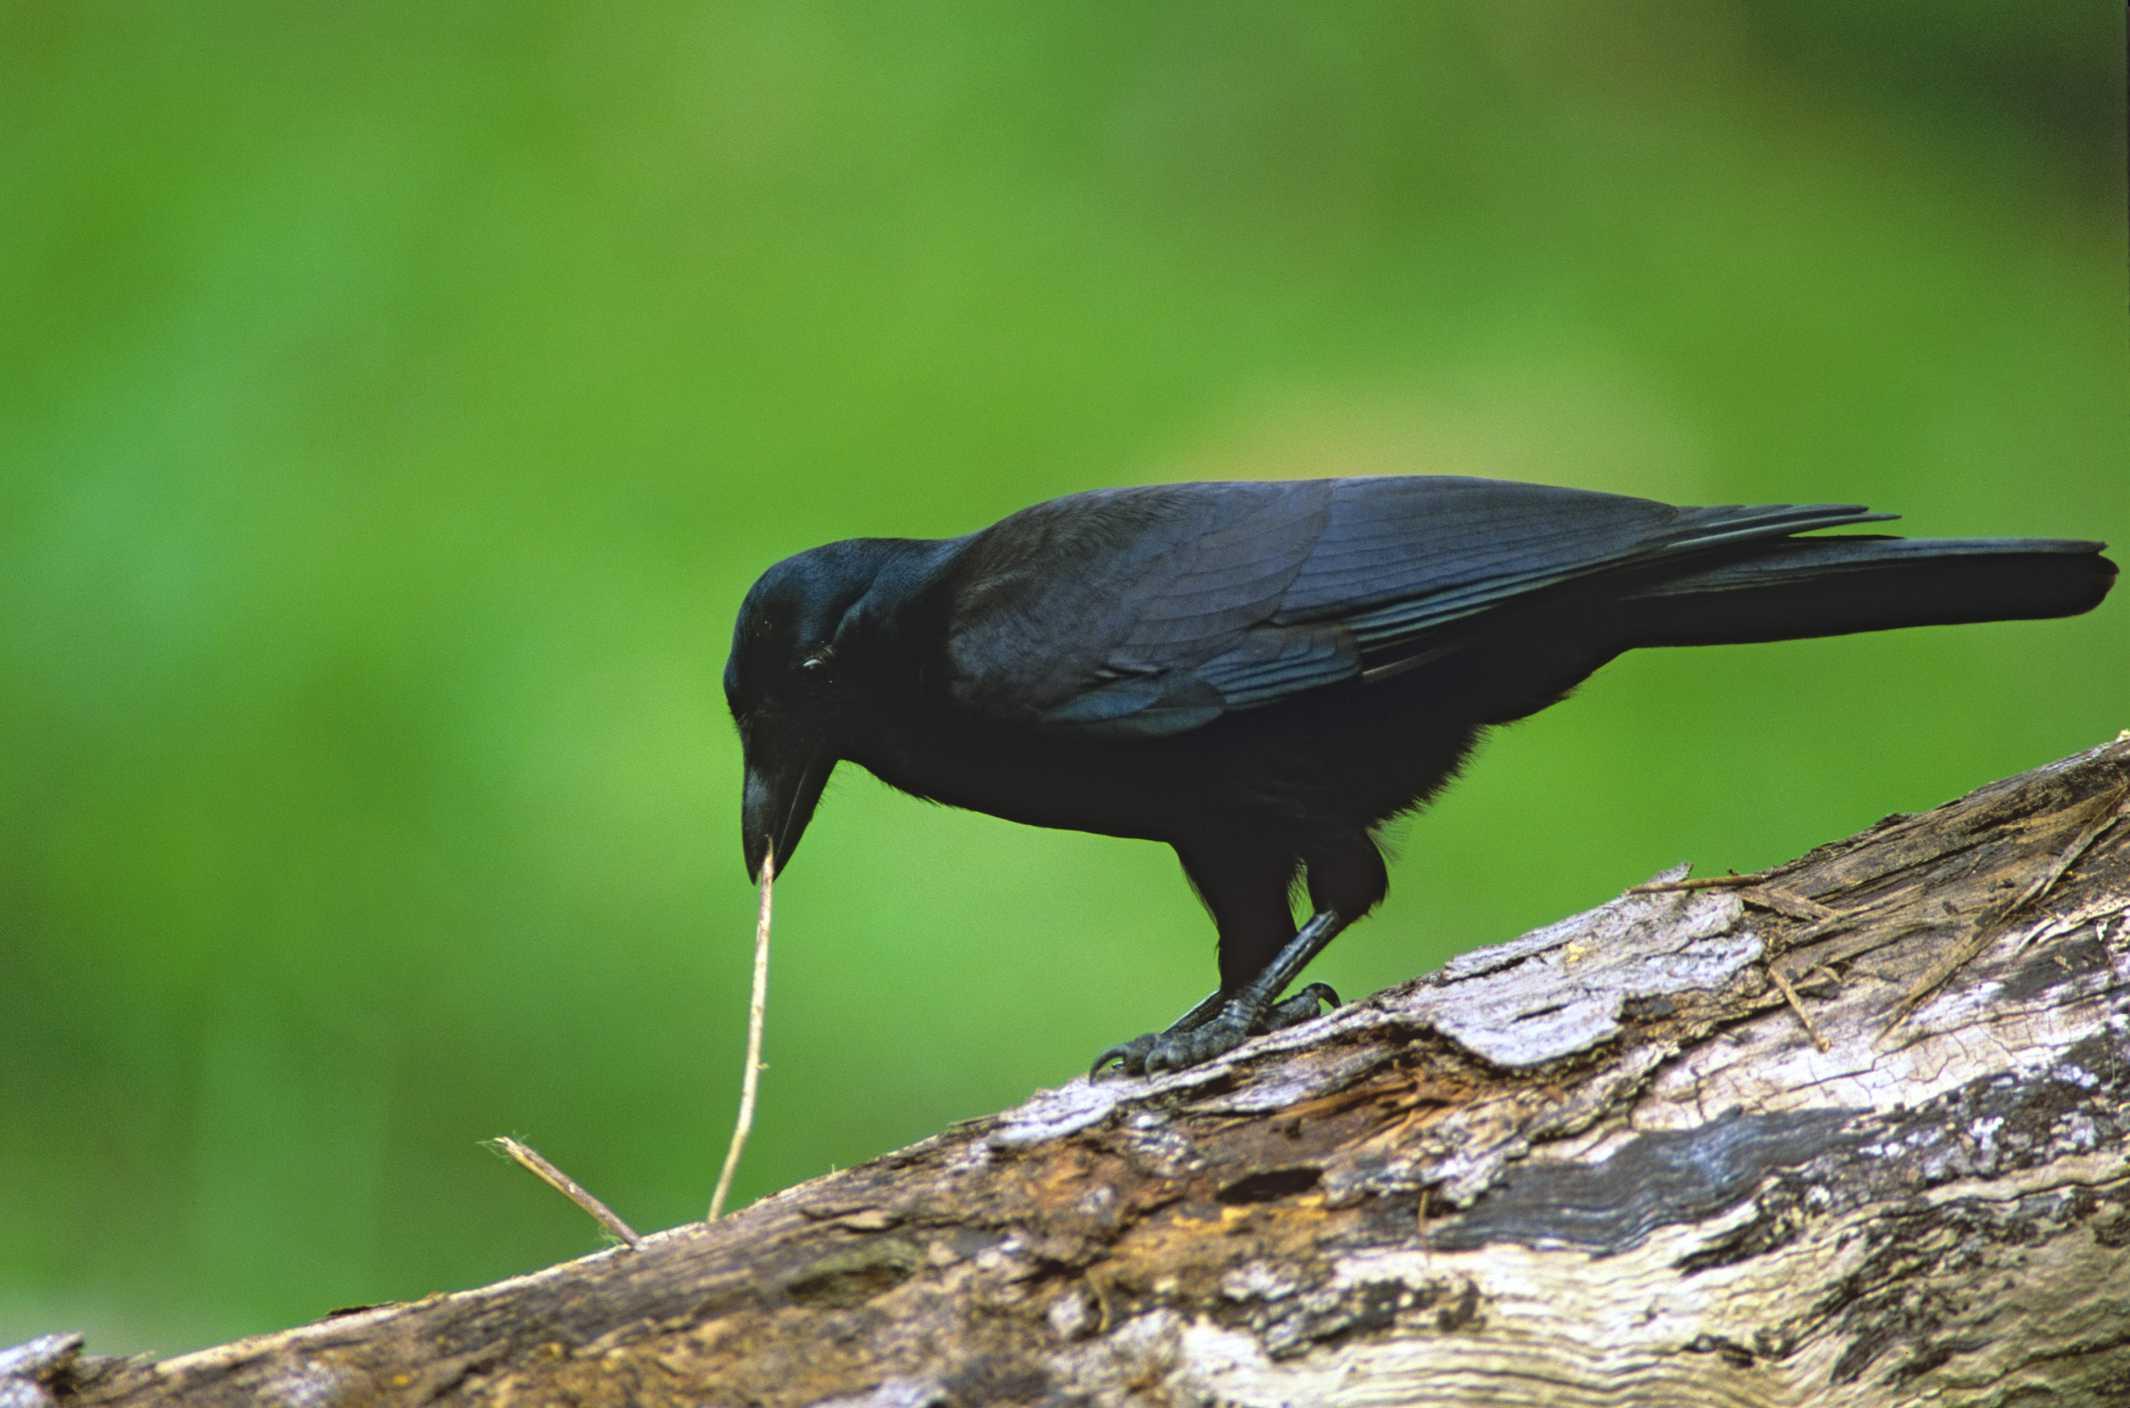 crow using tool to dislodge a worm.